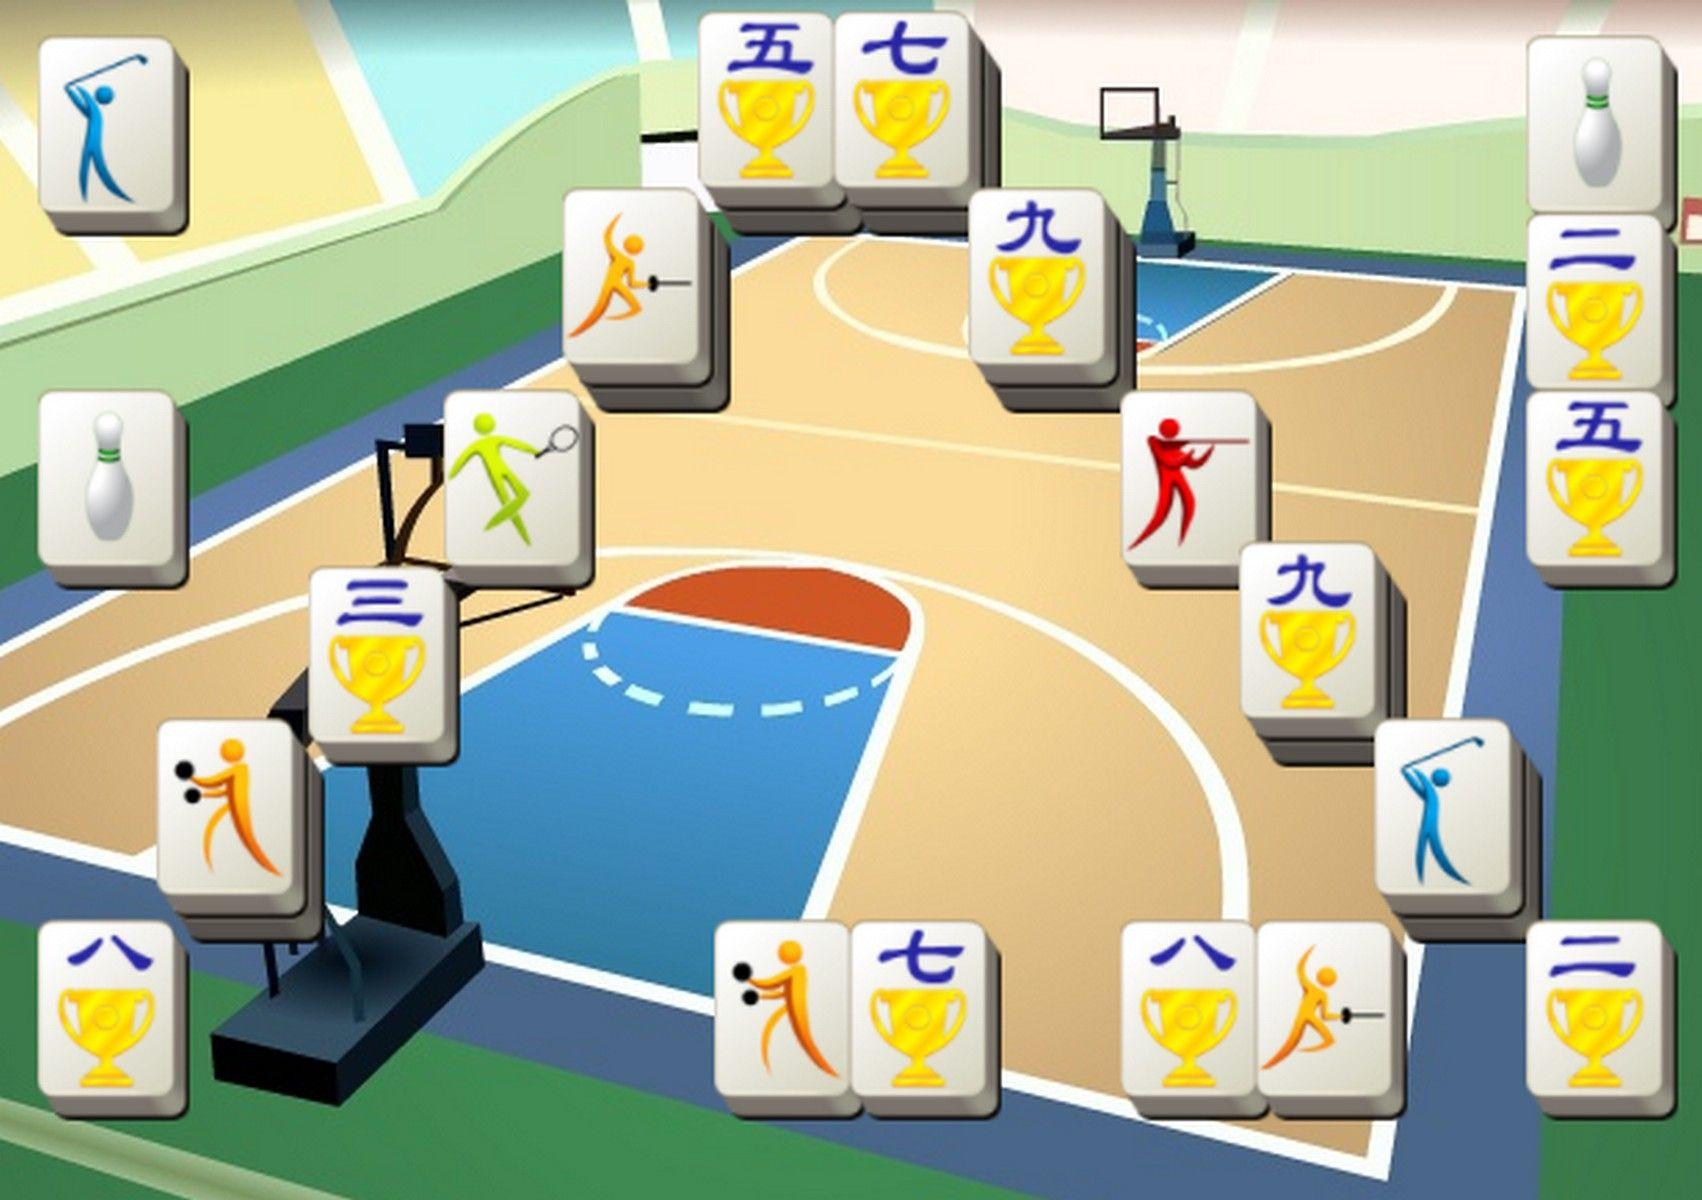 Sports Mahjong Free online games, Play arcade games